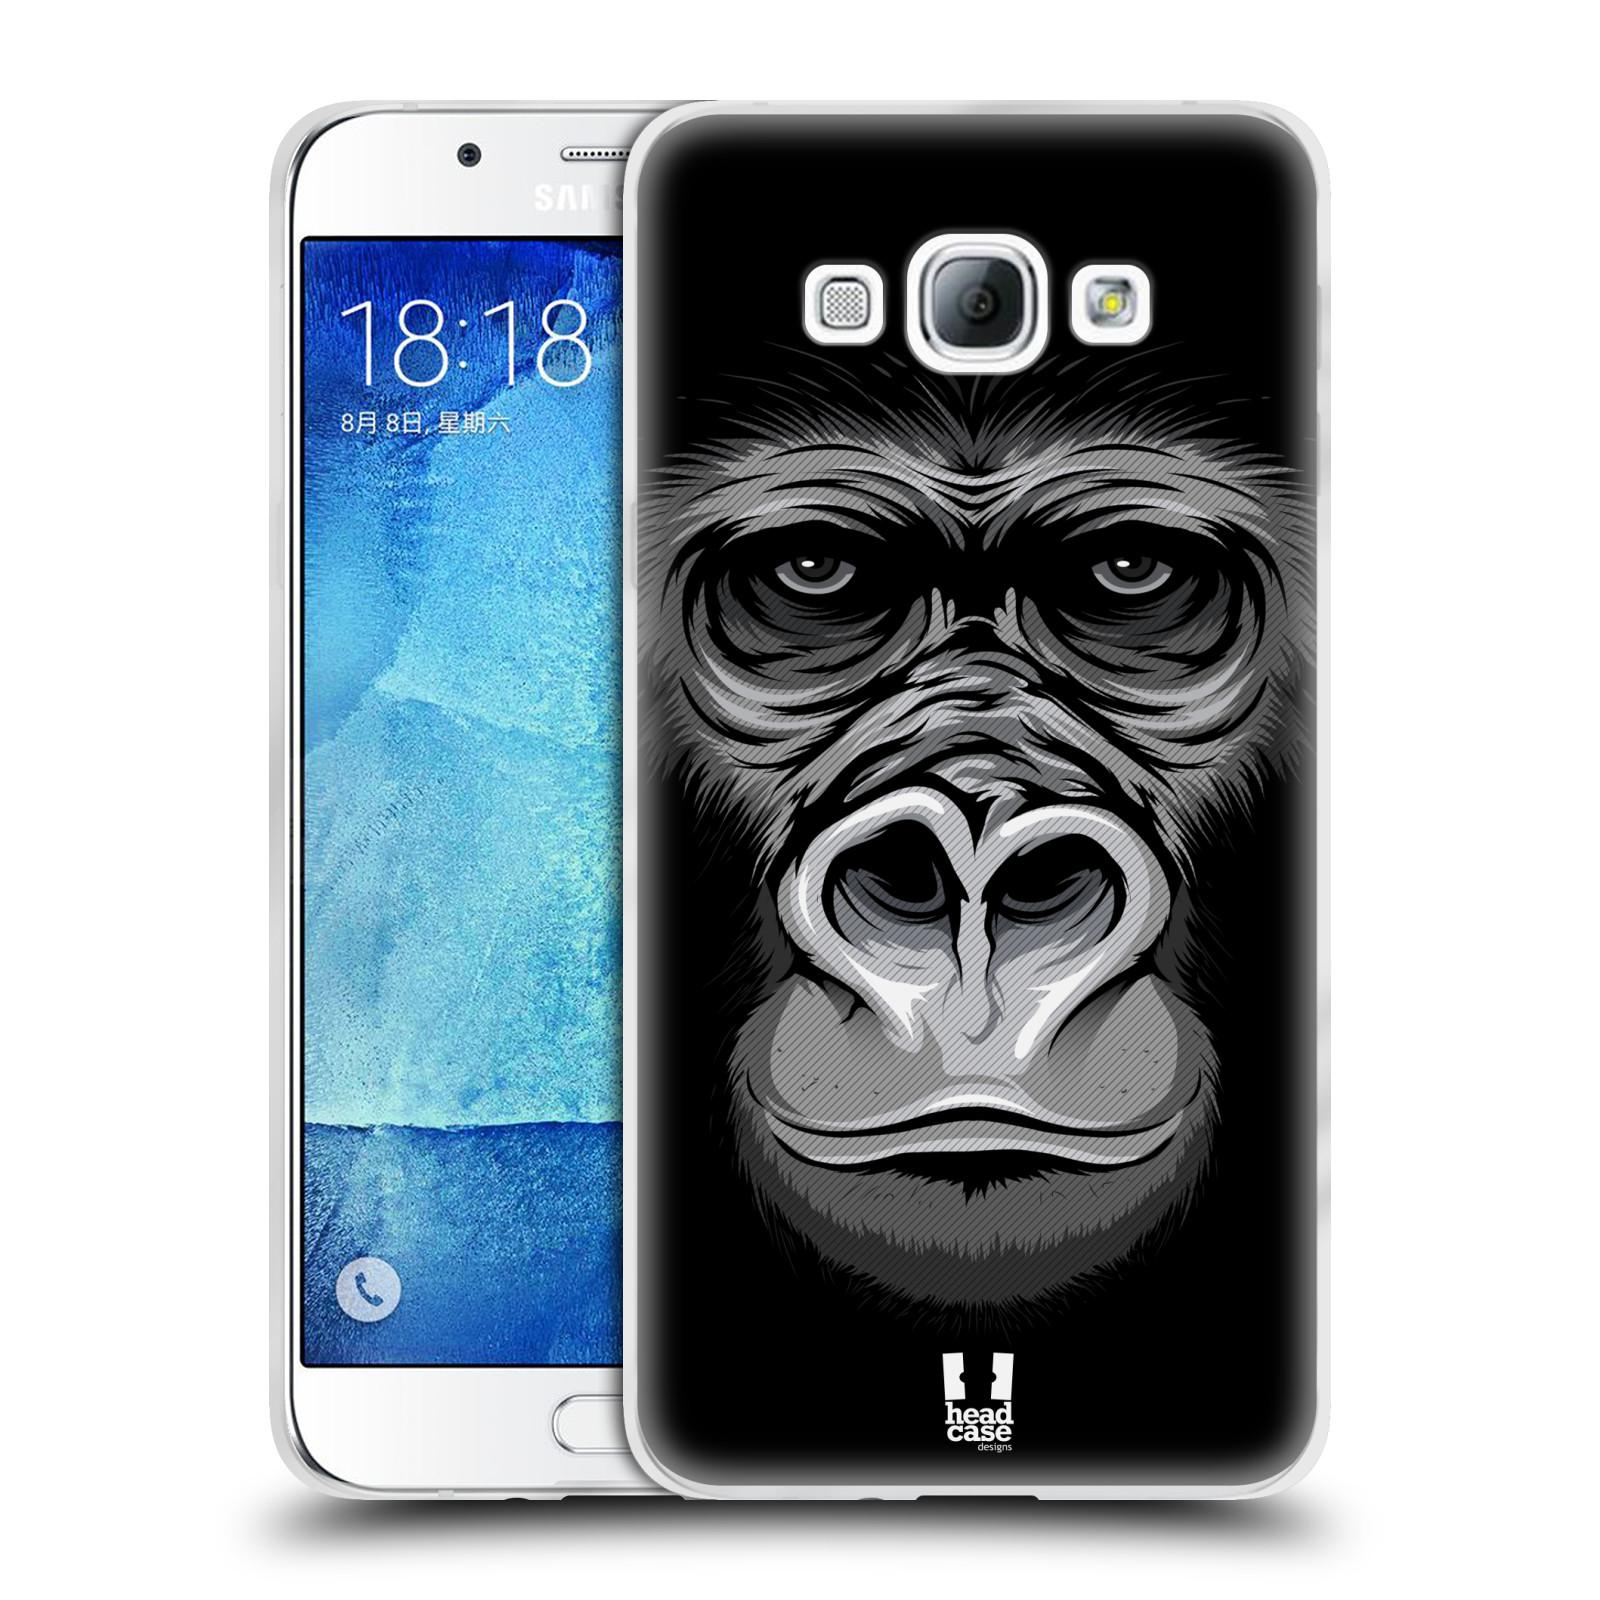 HEAD CASE silikonový obal na mobil Samsung Galaxy A8 vzor Zvíře kreslená tvář 2 gorila